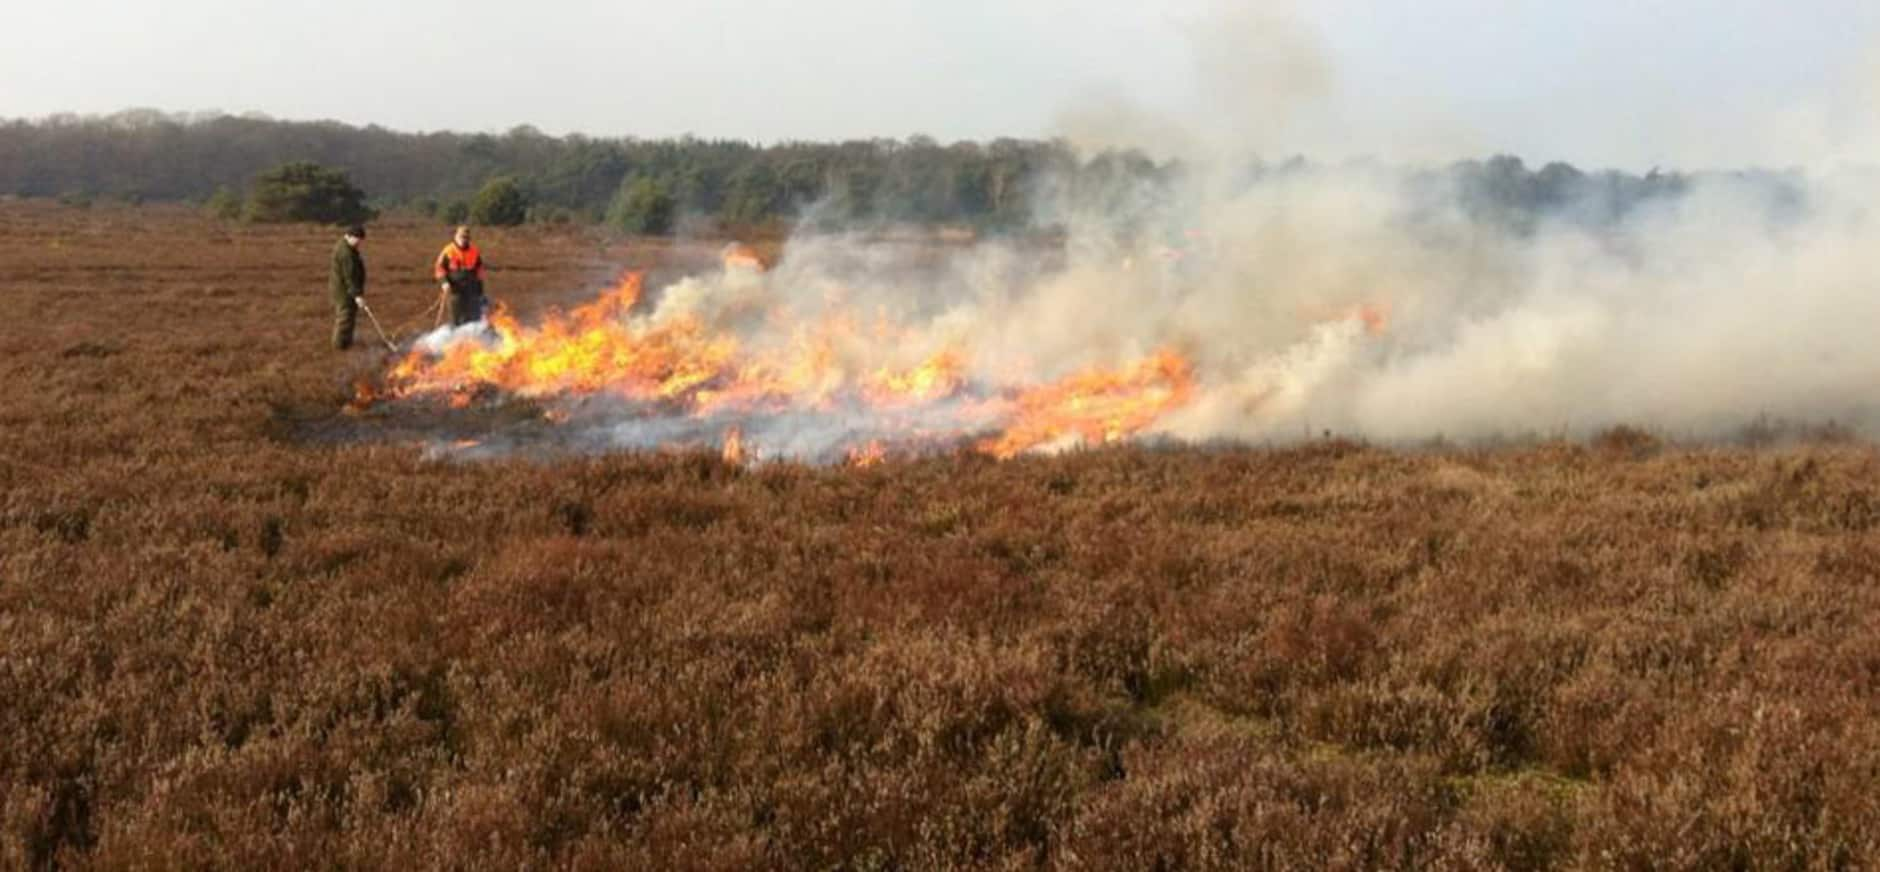 Natuurbrand in het Dwingelderveld